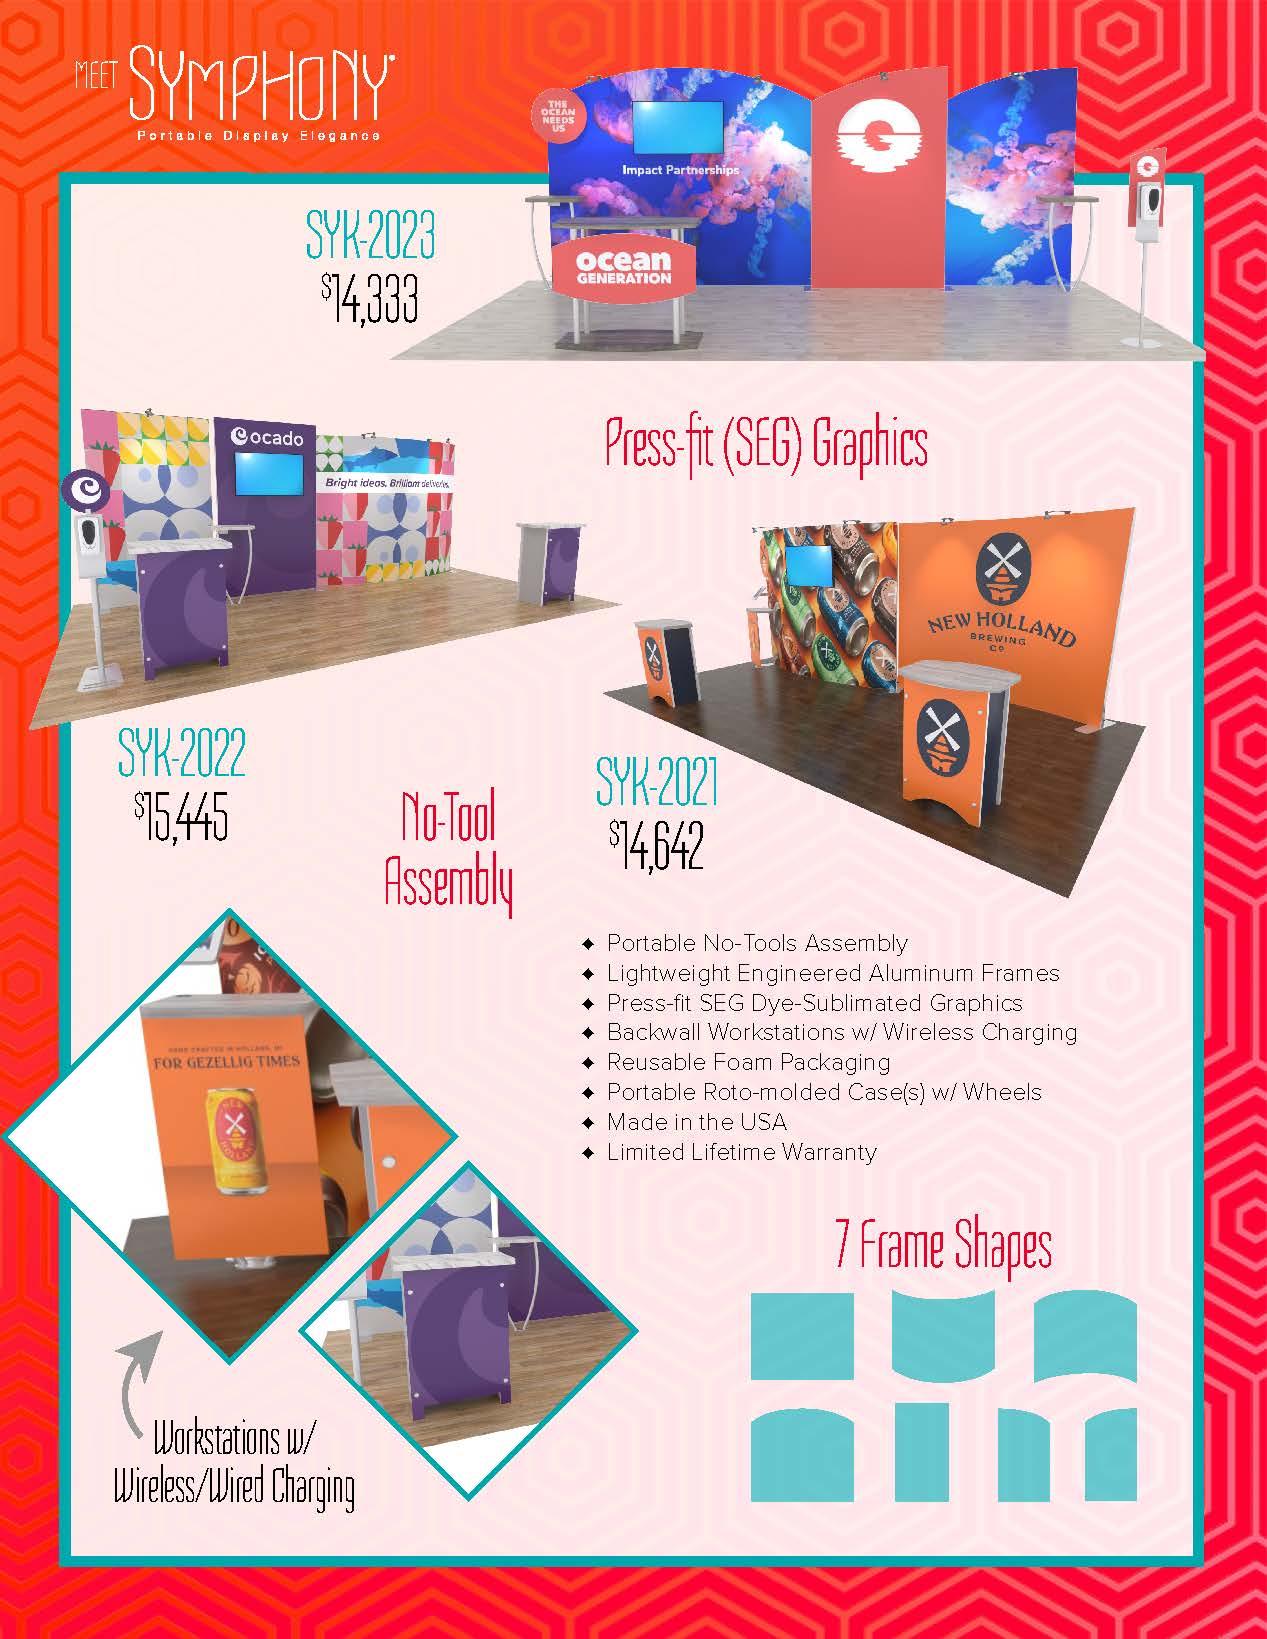 Symphony Portable Trade Show Displays